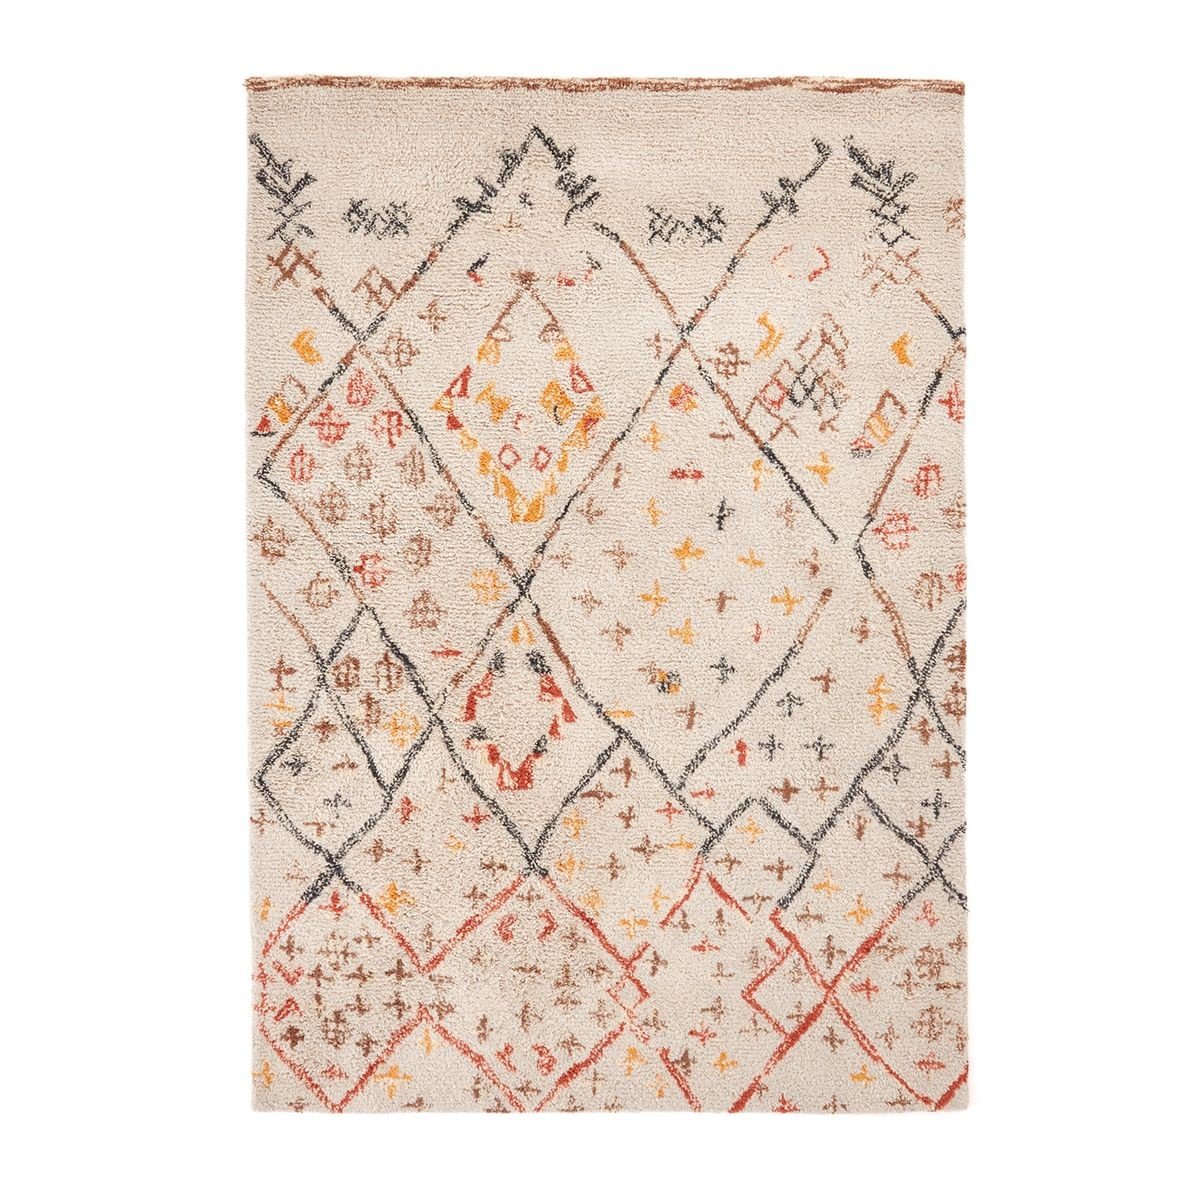 Tapis Style Berbere En Laine Ashwin Taille 120x180 Cm 160x230 Cm 200x290 Cm Tapis Style Berbere Tapis Laine Et Tapis